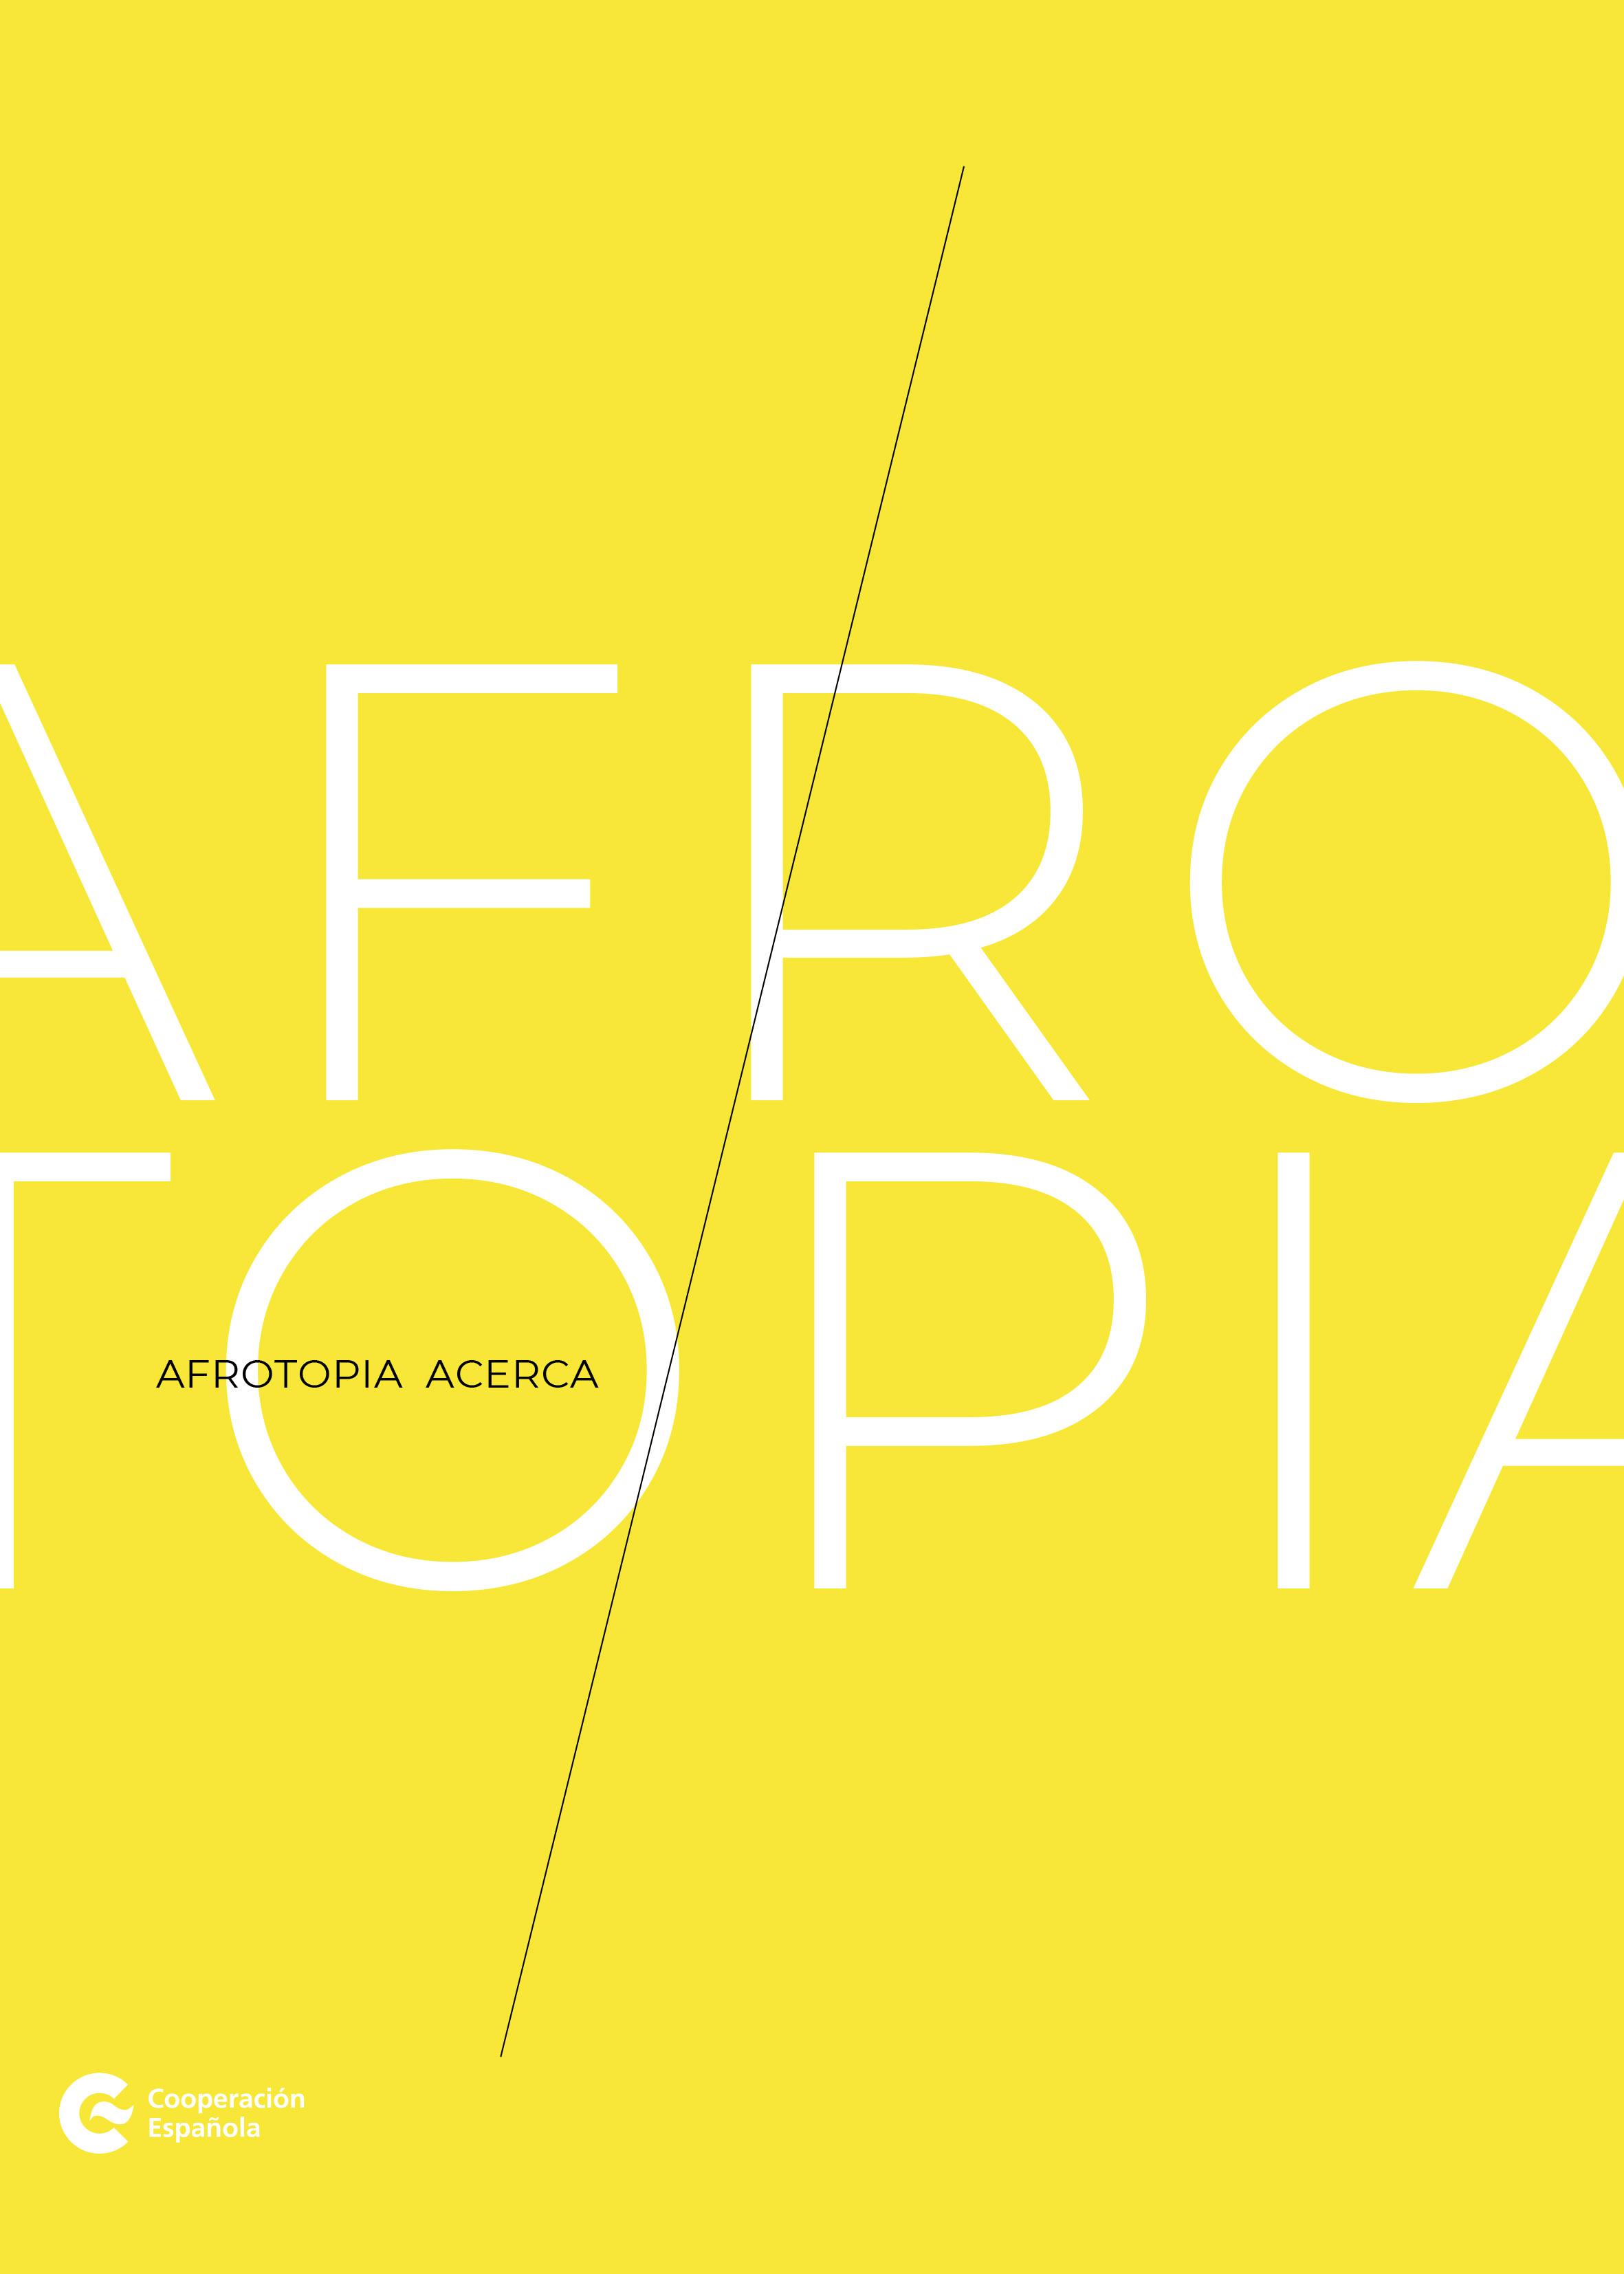 Afrotopia_completo_BR (1)-1.jpg